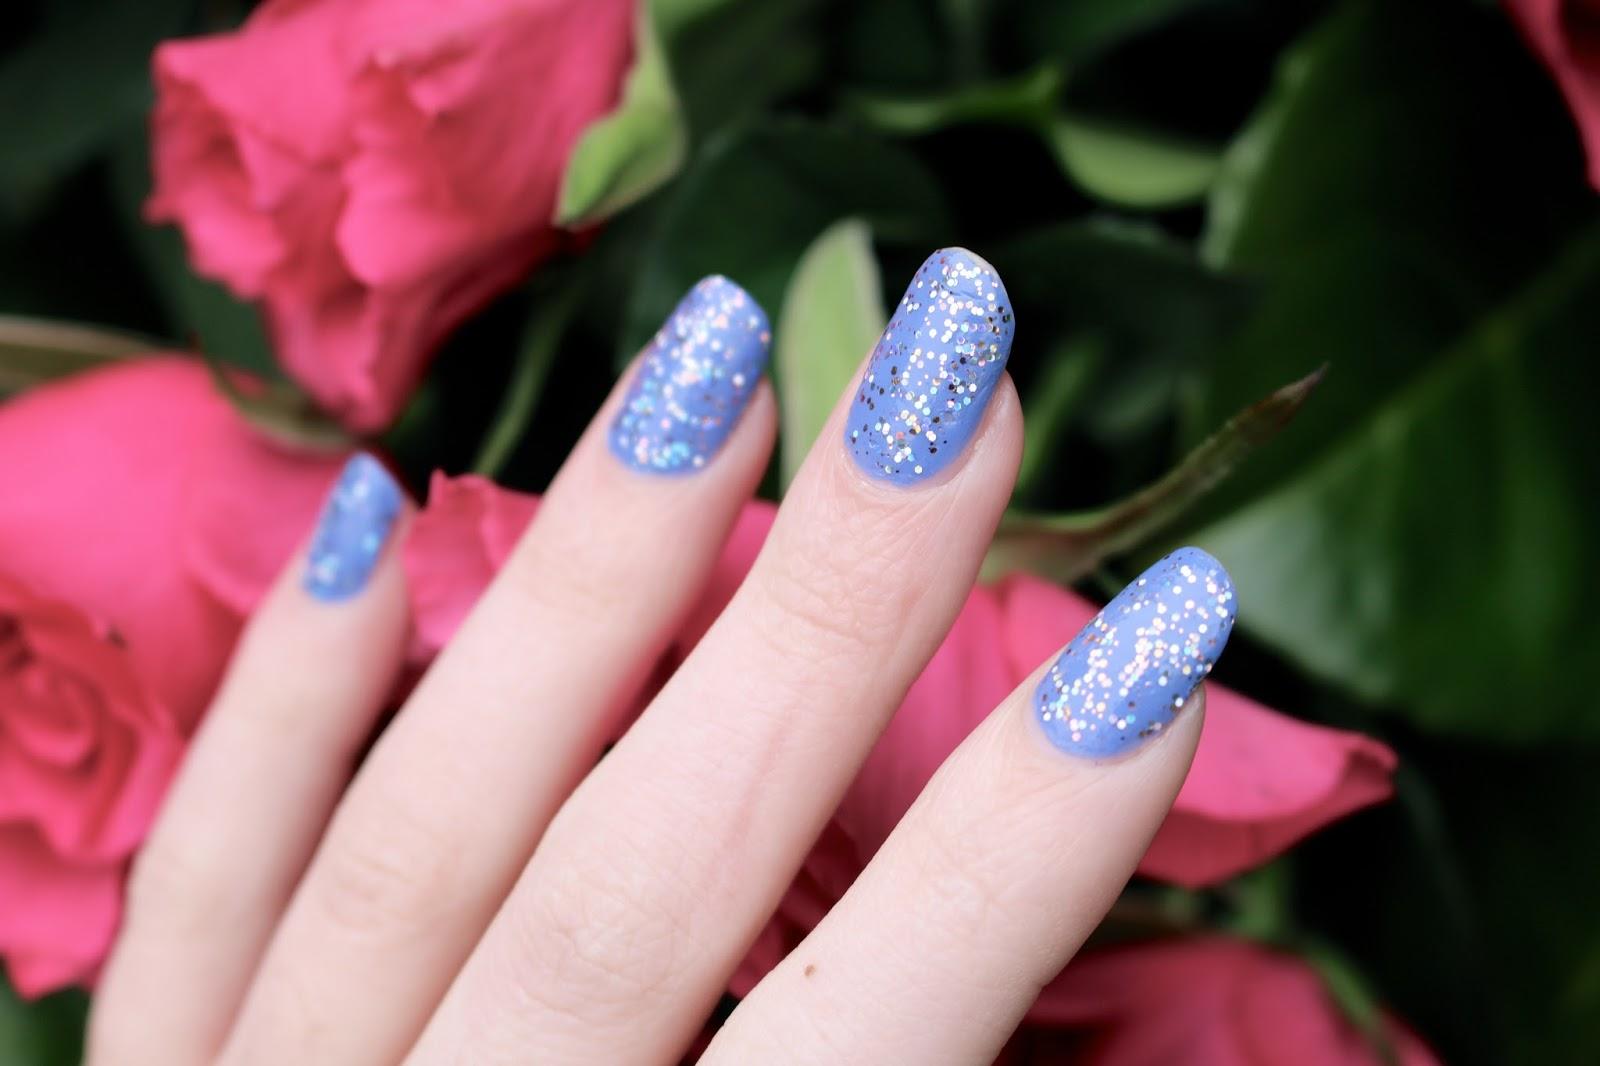 uk beauty nail blogger 2016